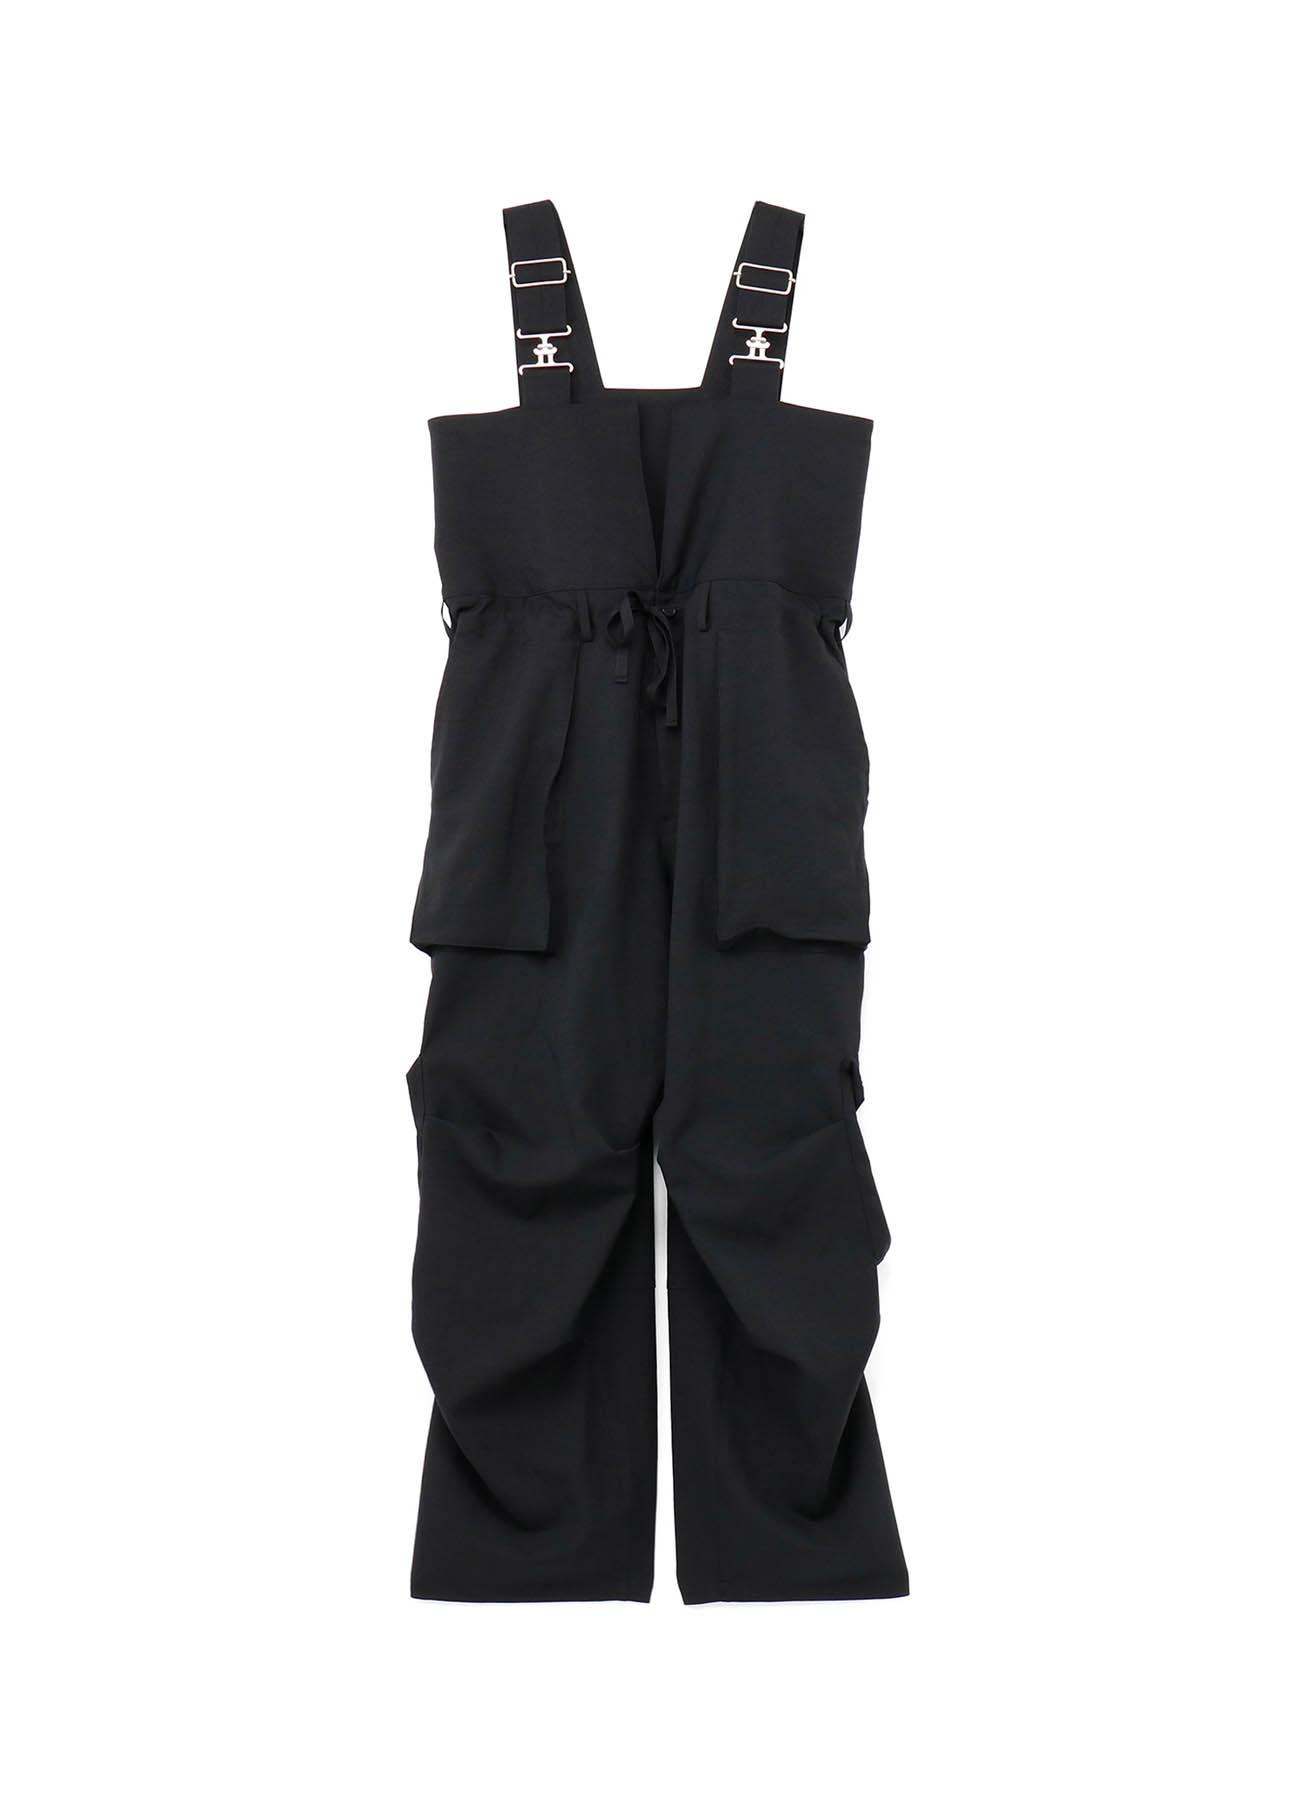 Shiwanoaru P/e Stretch Twill Zip Pocket Parachute Deck Pants